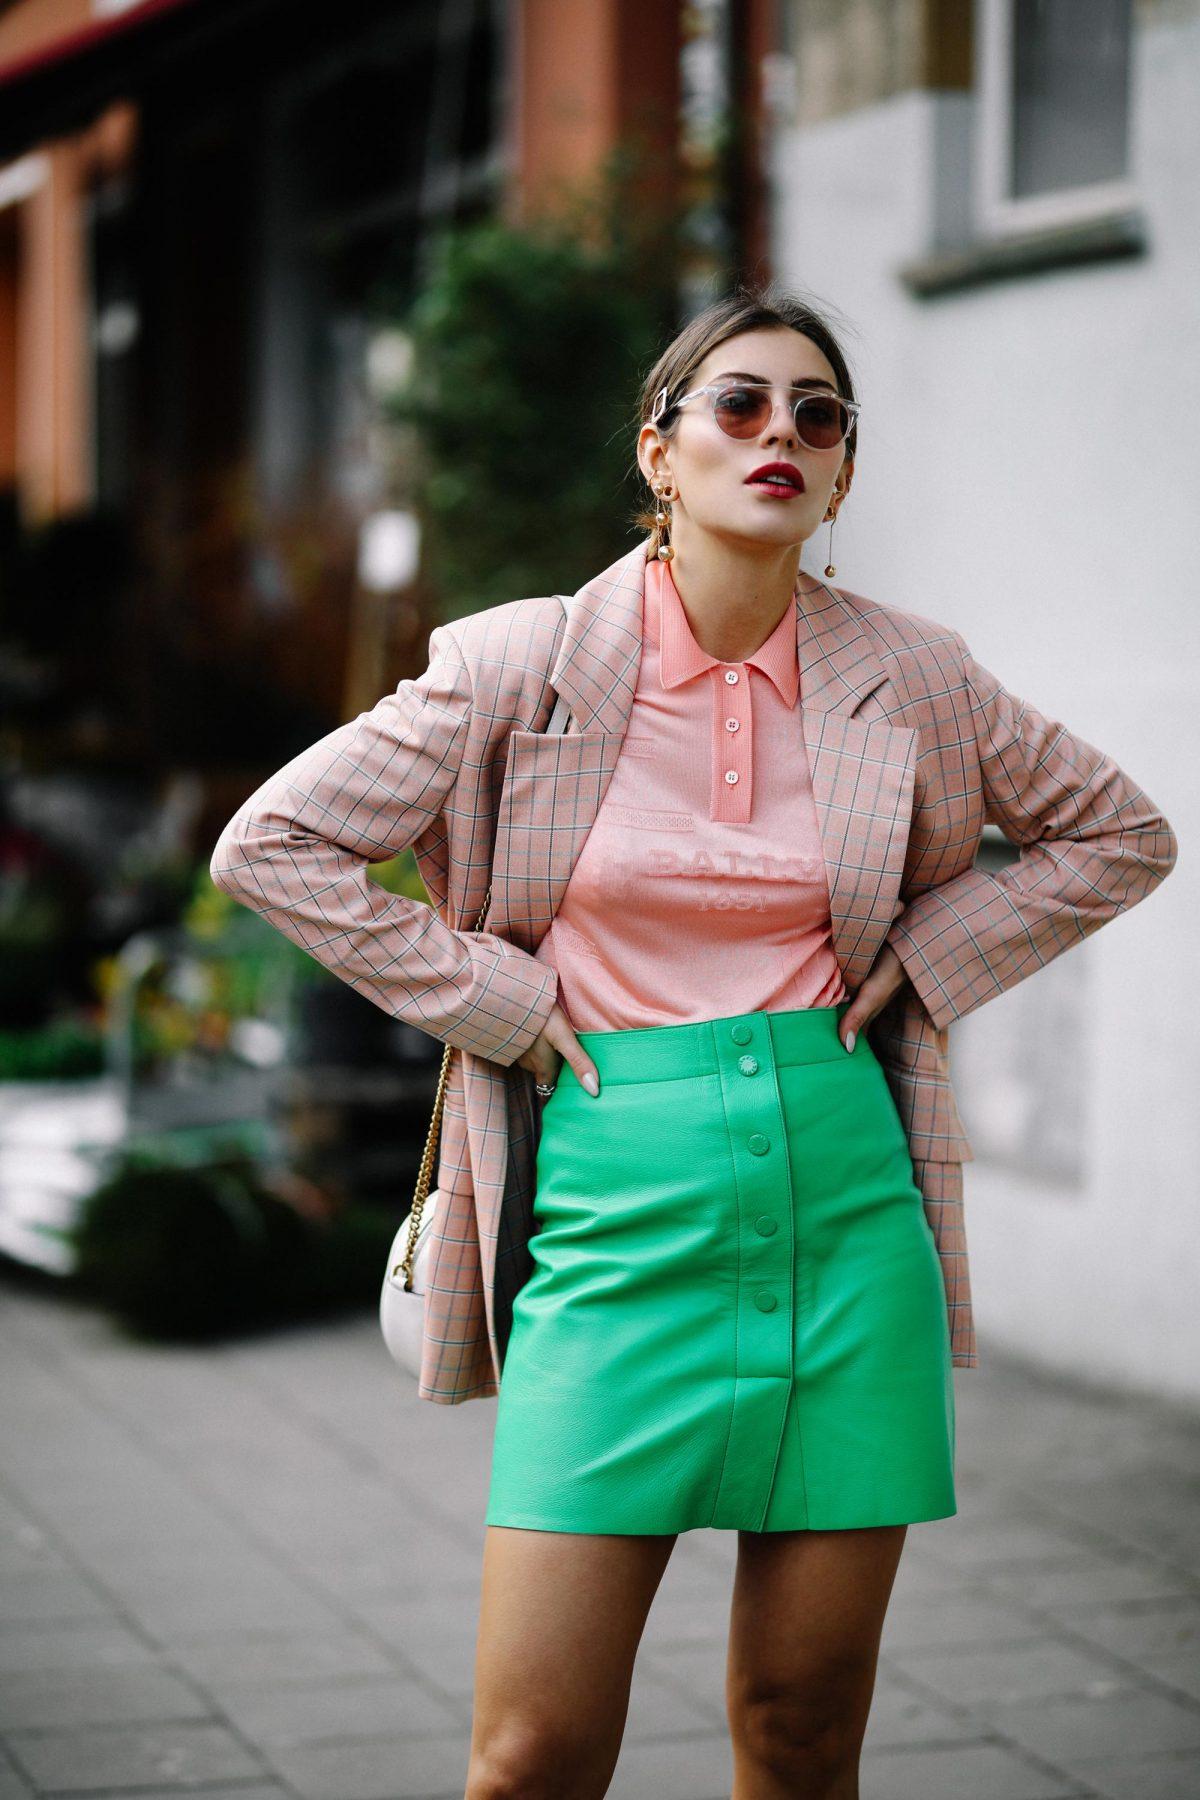 The Pink Blazer